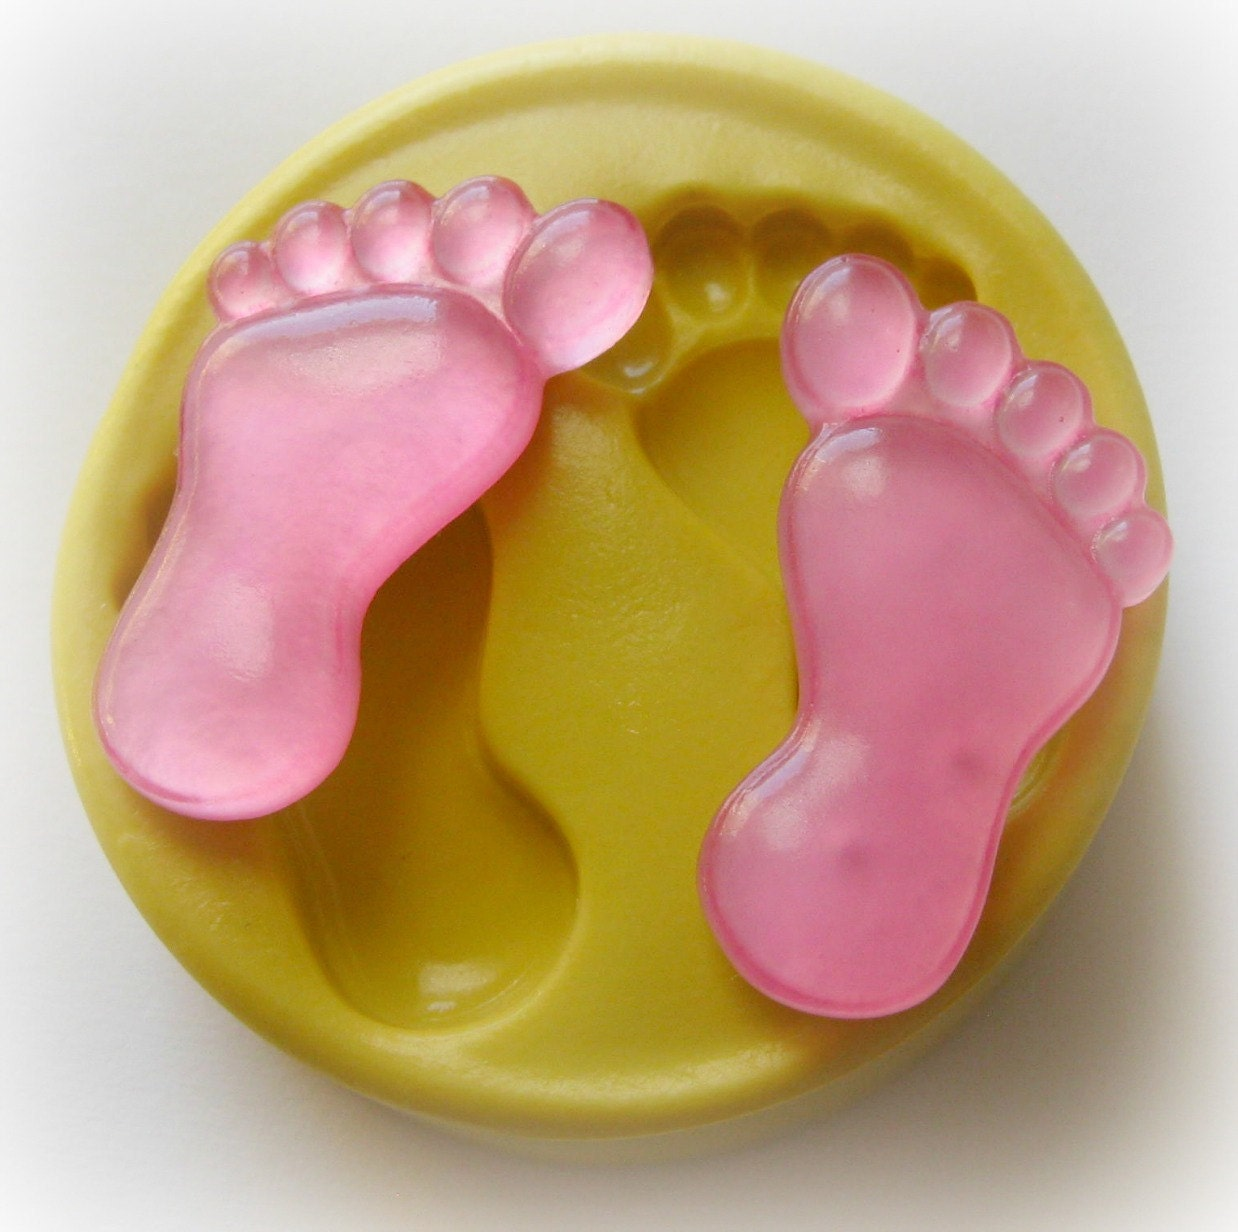 fondant baby molds